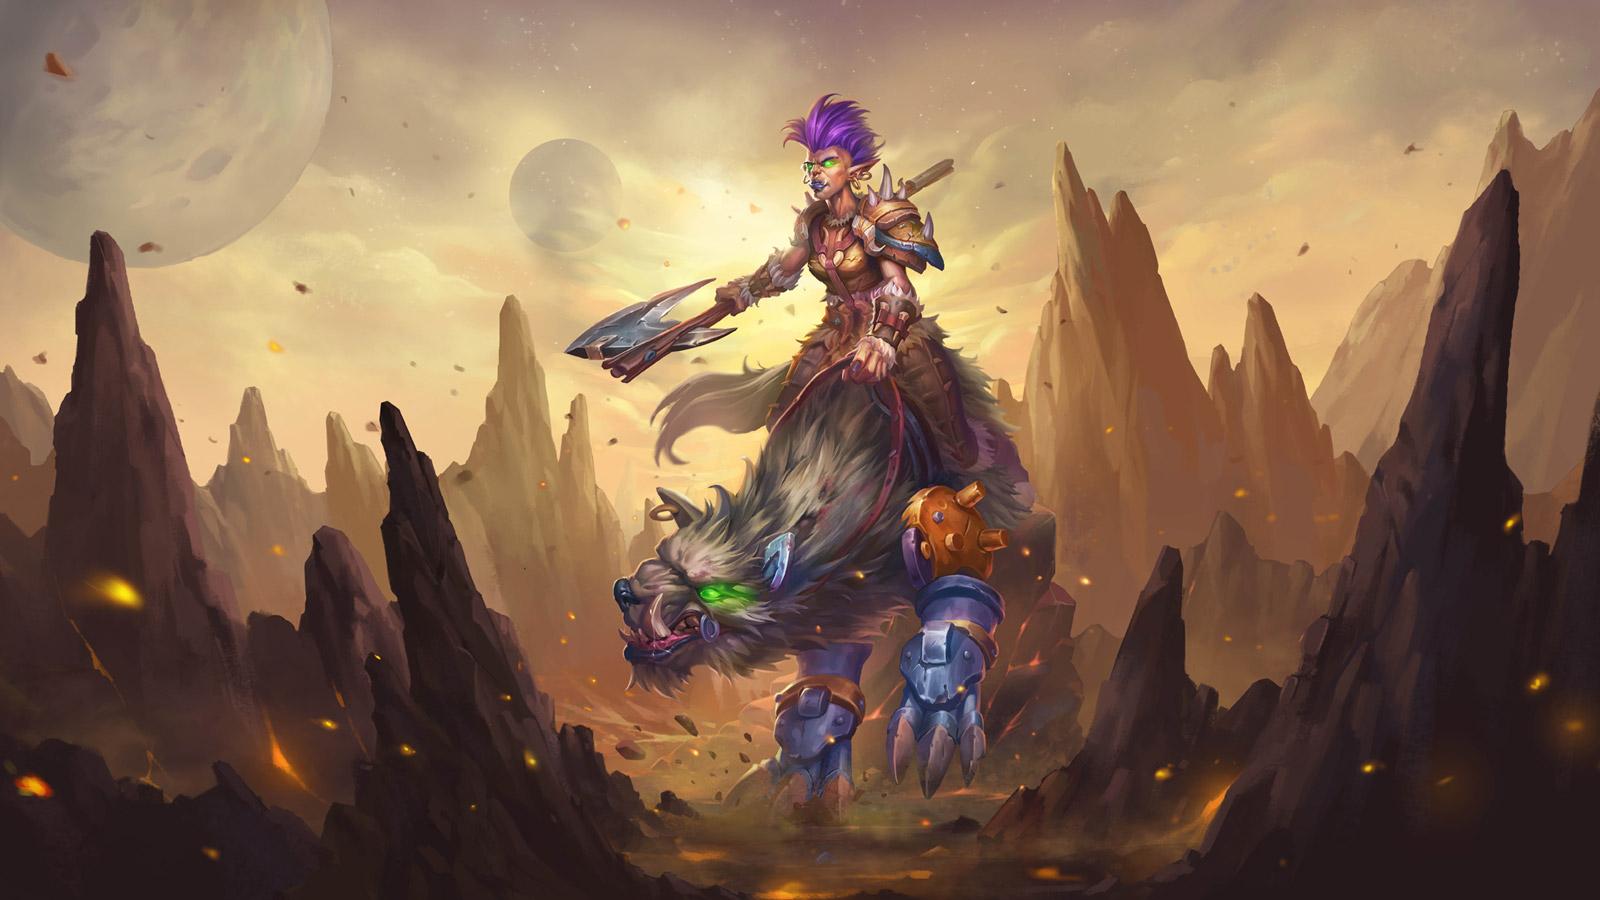 Free Hearthstone: Heroes of Warcraft Wallpaper in 1600x900